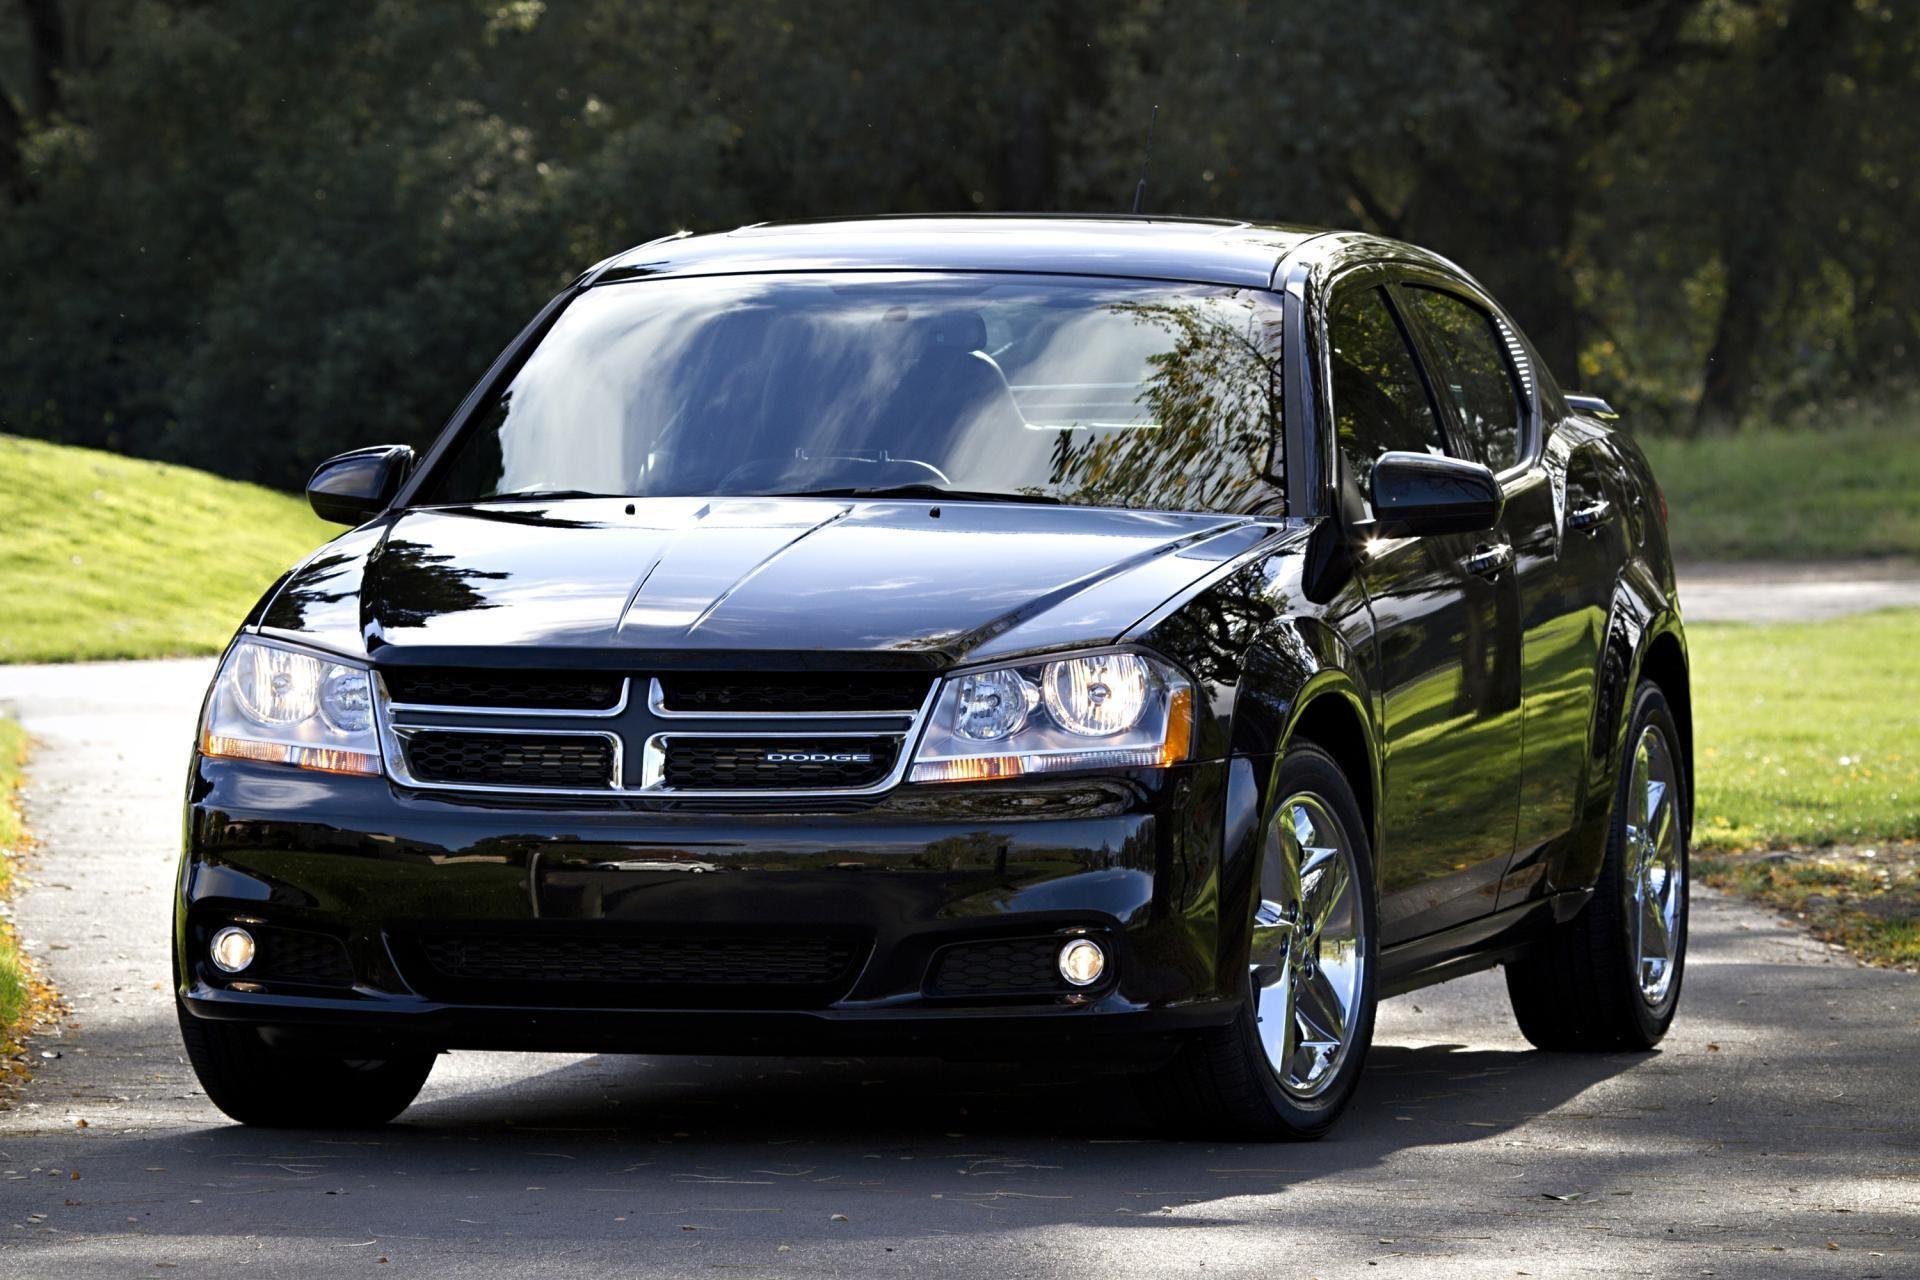 2020 dodge avenger redesign changes and price rumors car rumor